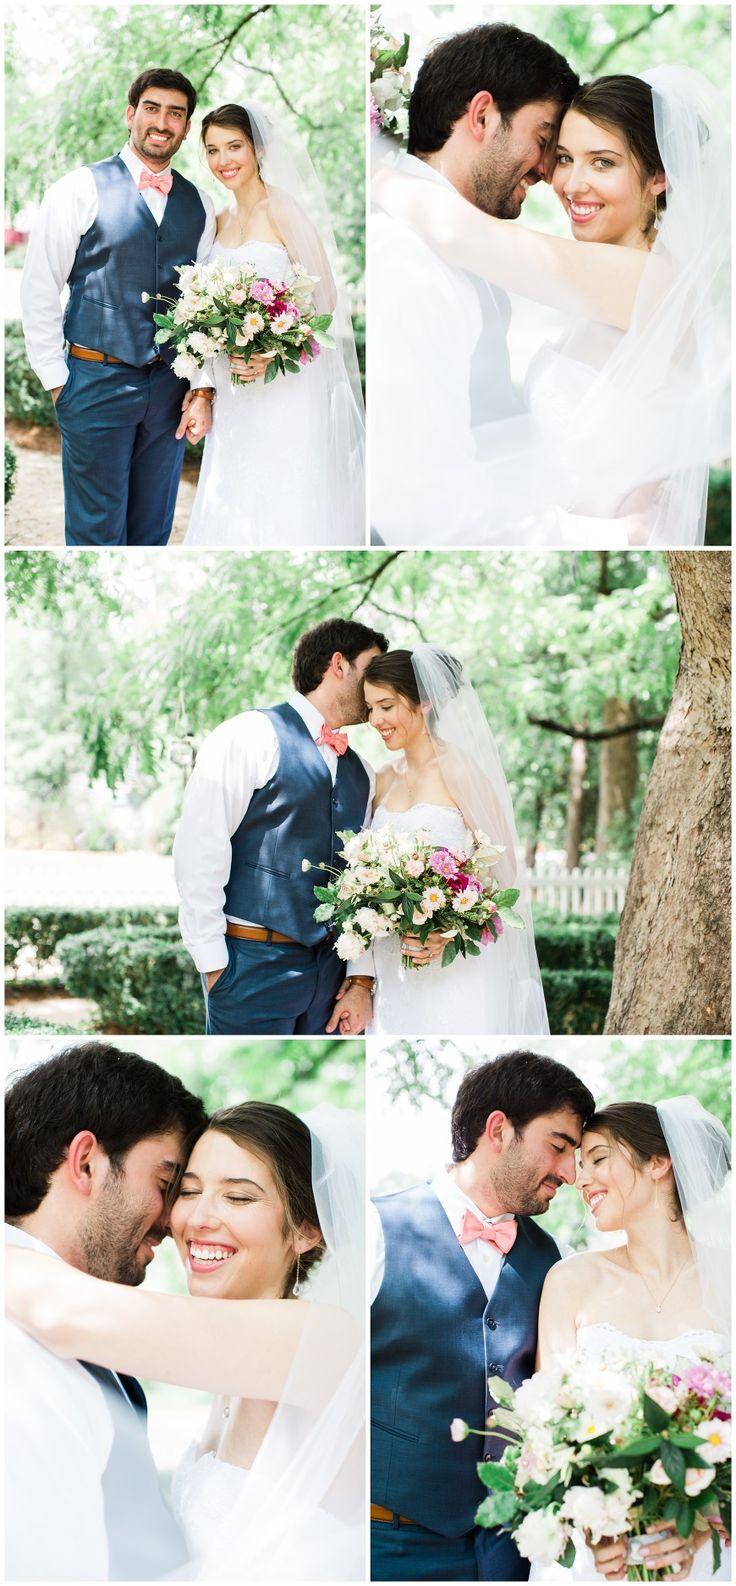 23 Best 2016 Weddings Images On Pinterest Destination Lauren Michael Athens Ga